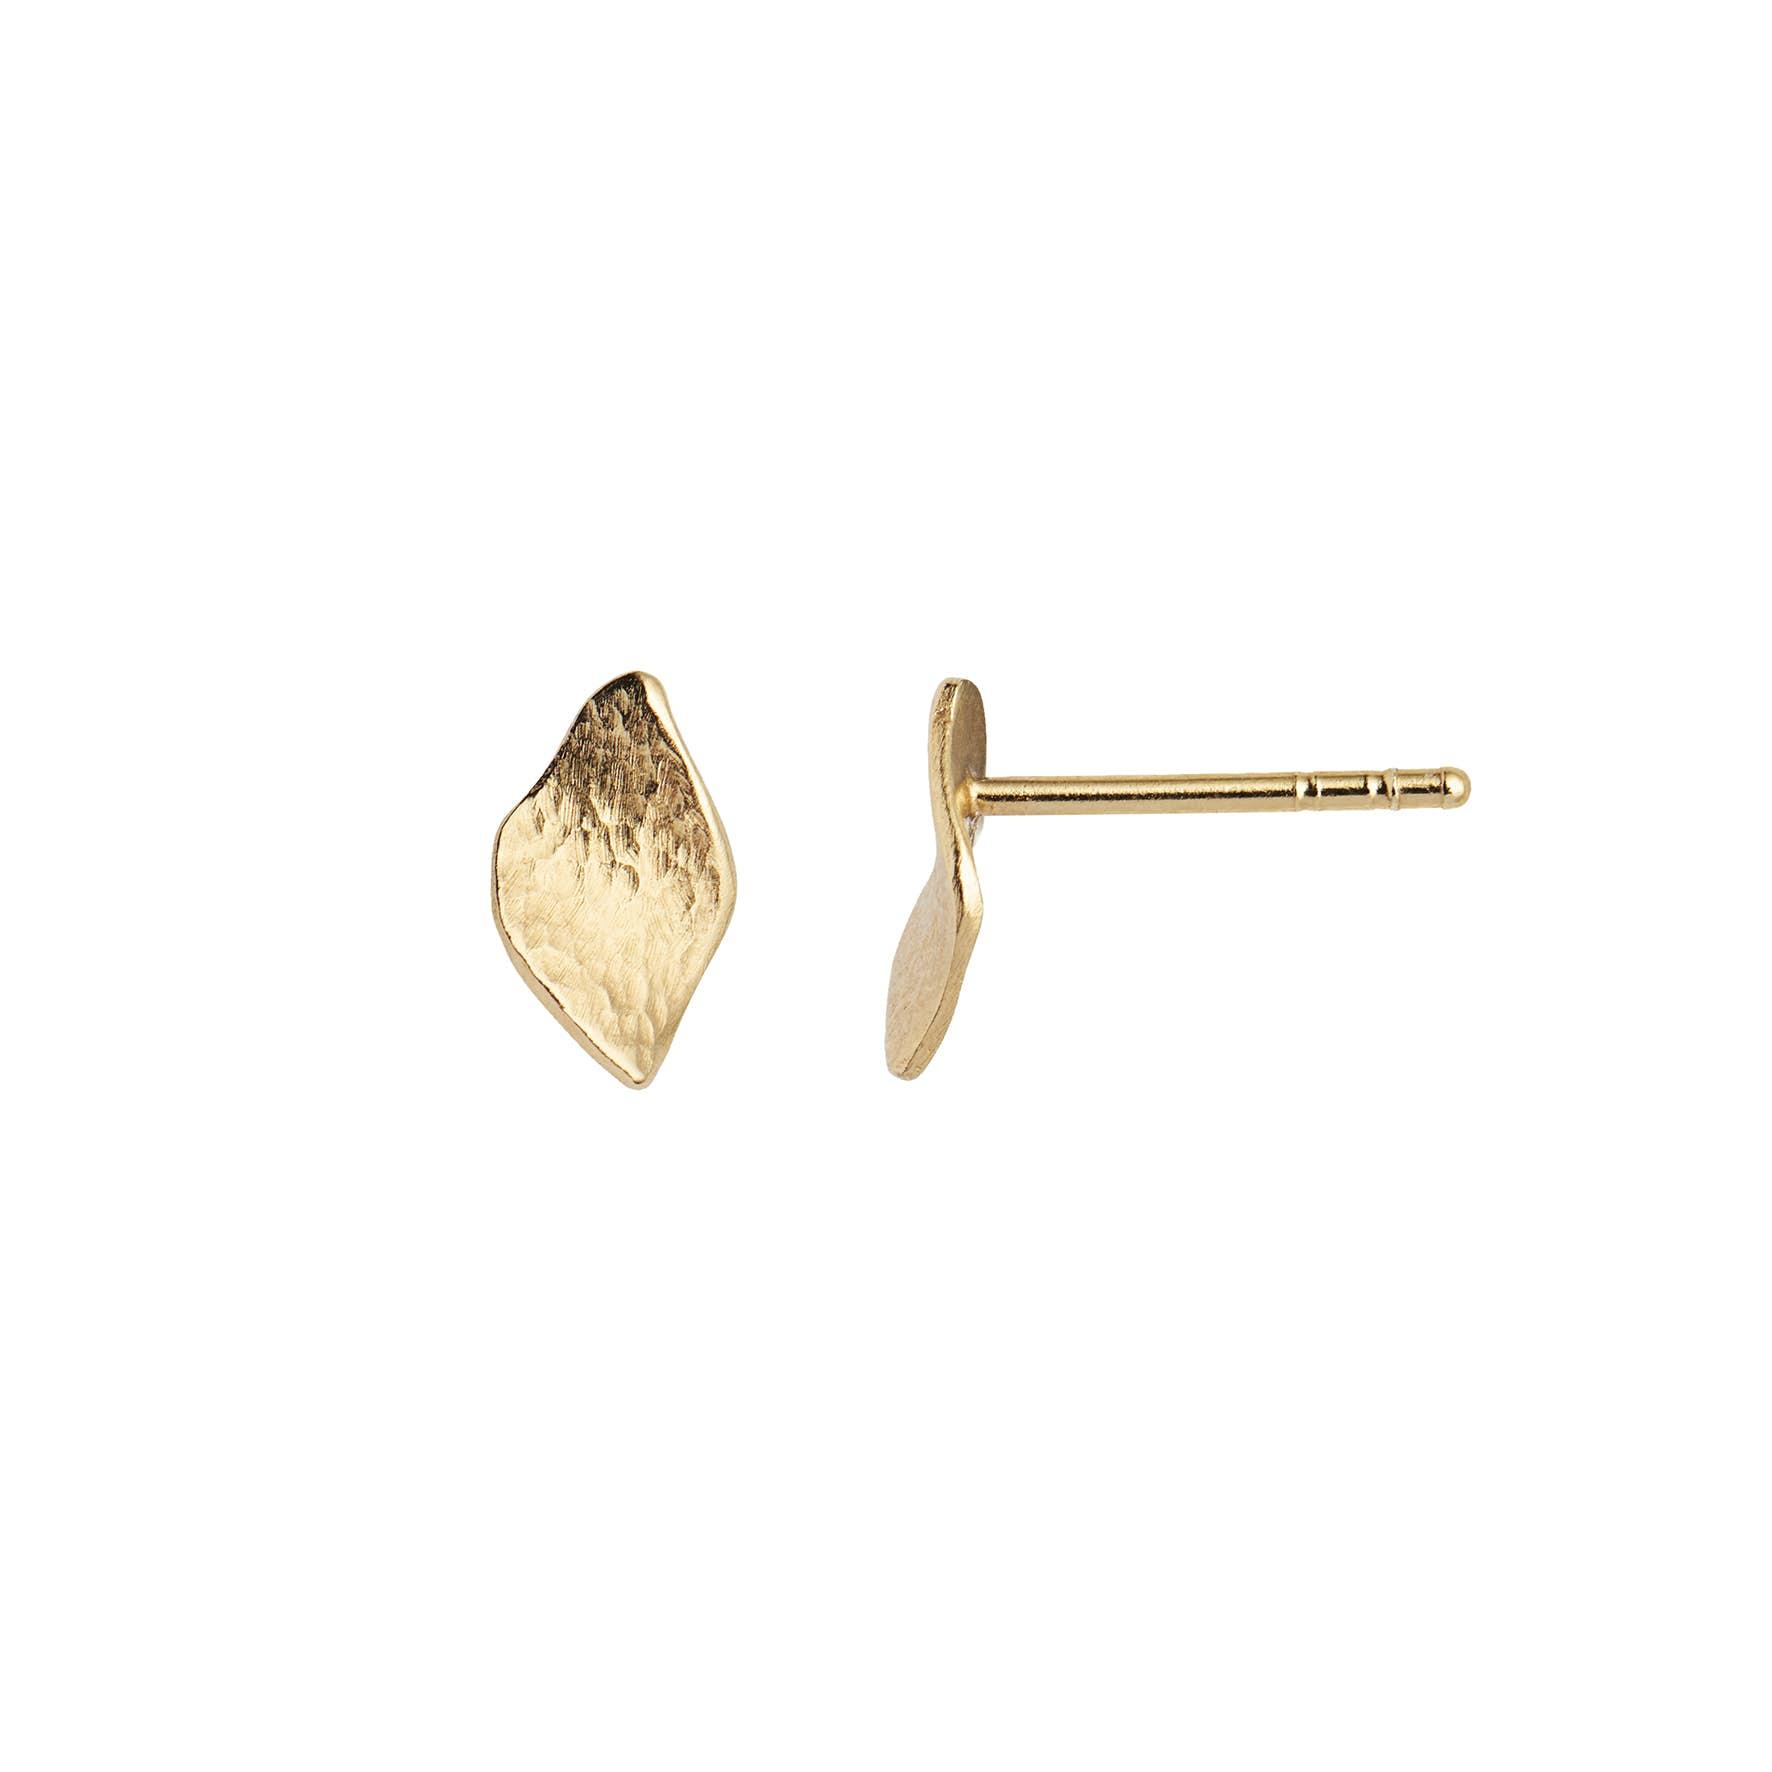 Petit Ile De L'Amour Earstick von STINE A Jewelry in Vergoldet-Silber Sterling 925